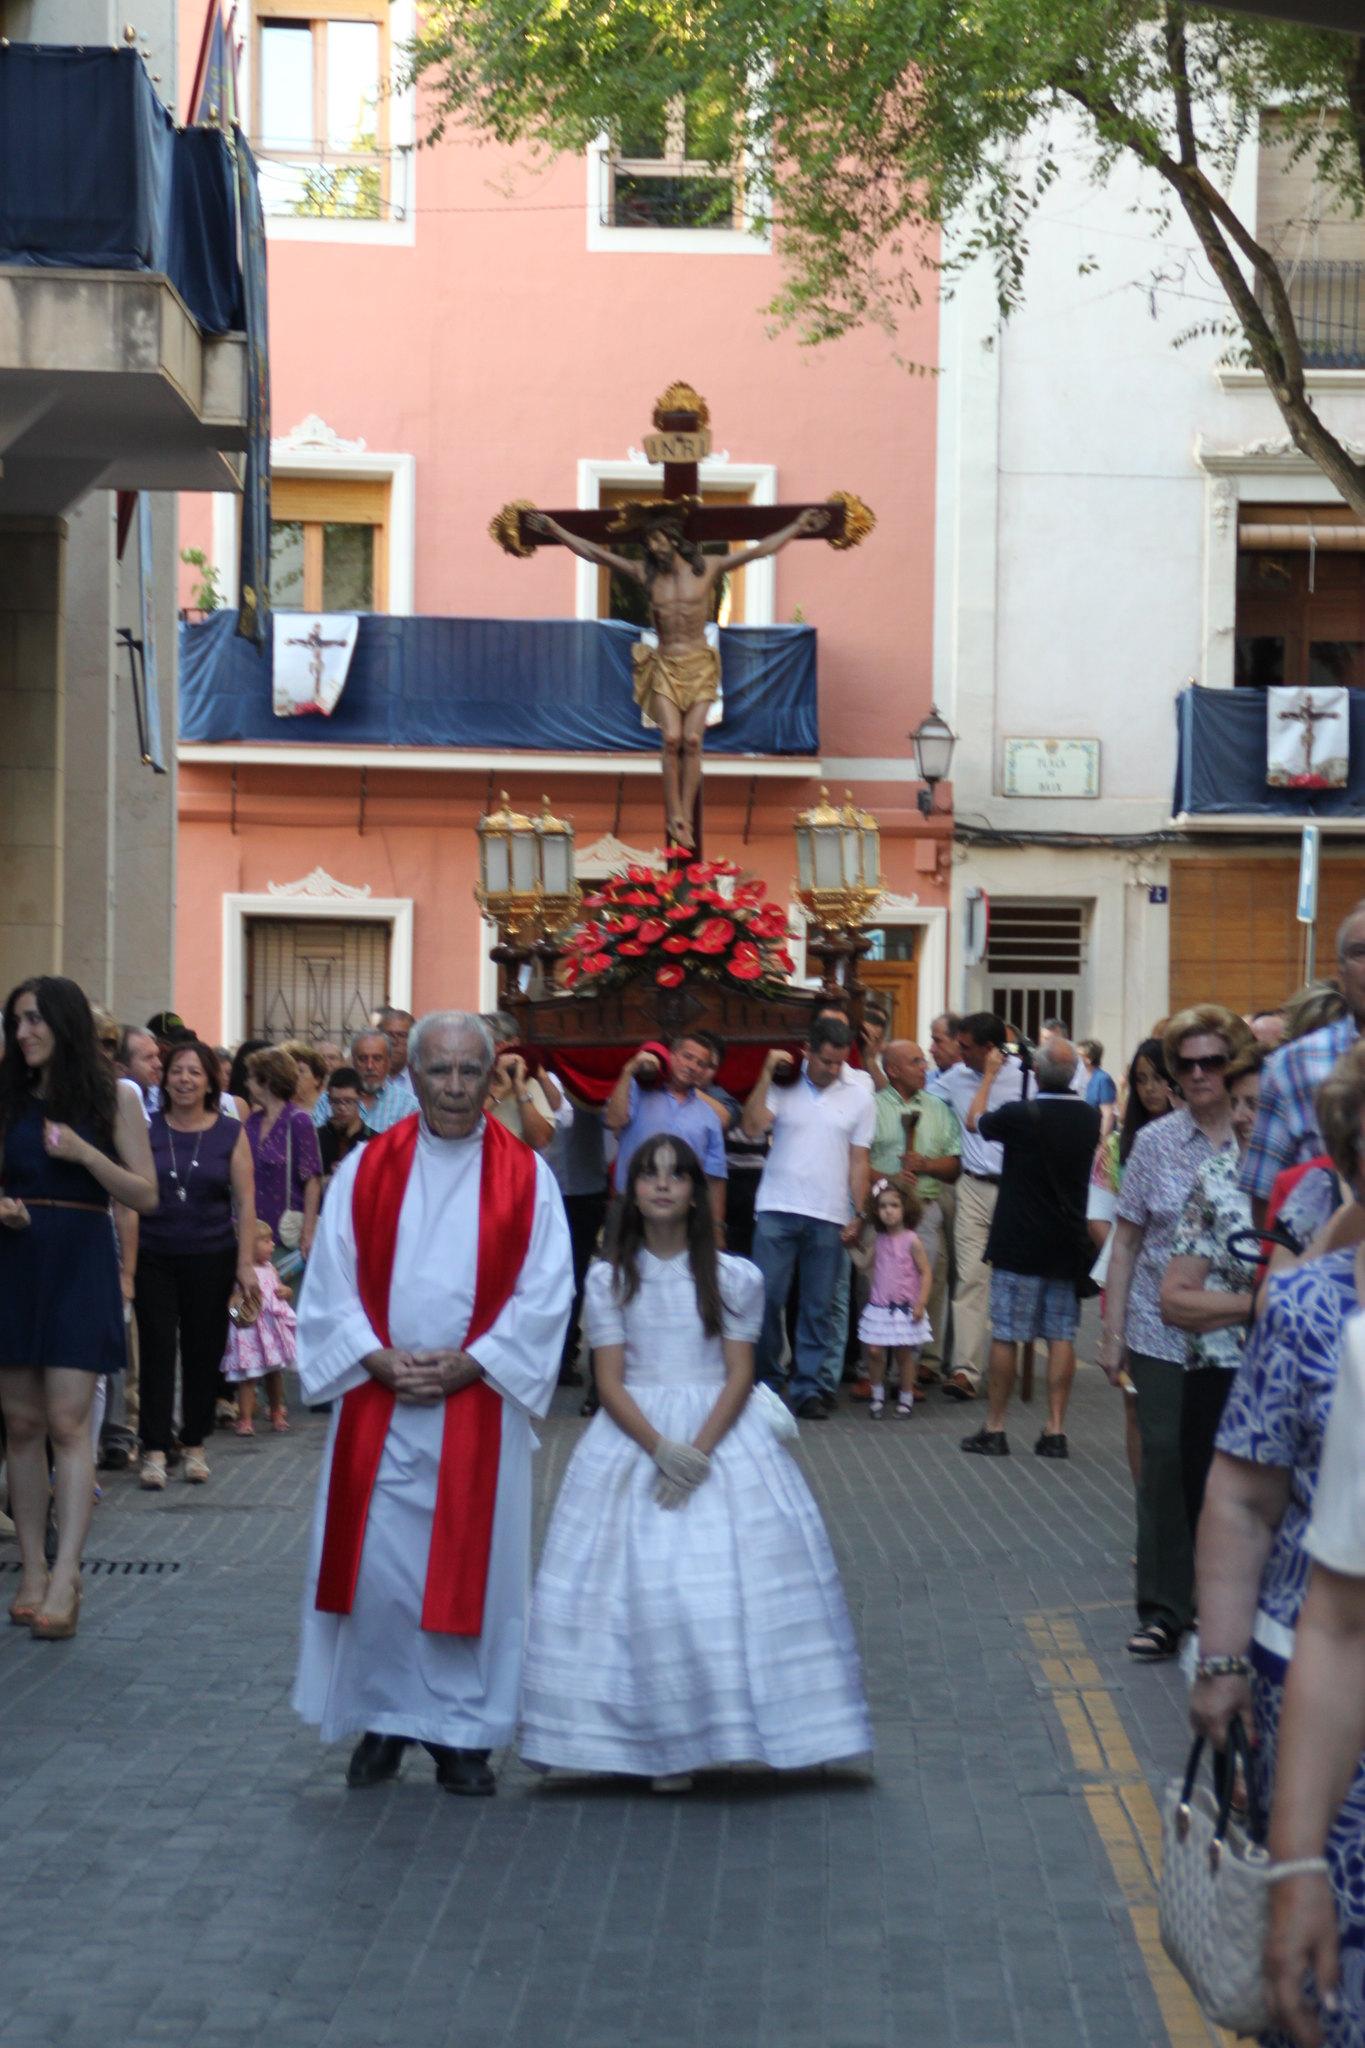 (2013-07-07) -  Procesión subida - Javier Romero Ripoll  (29)